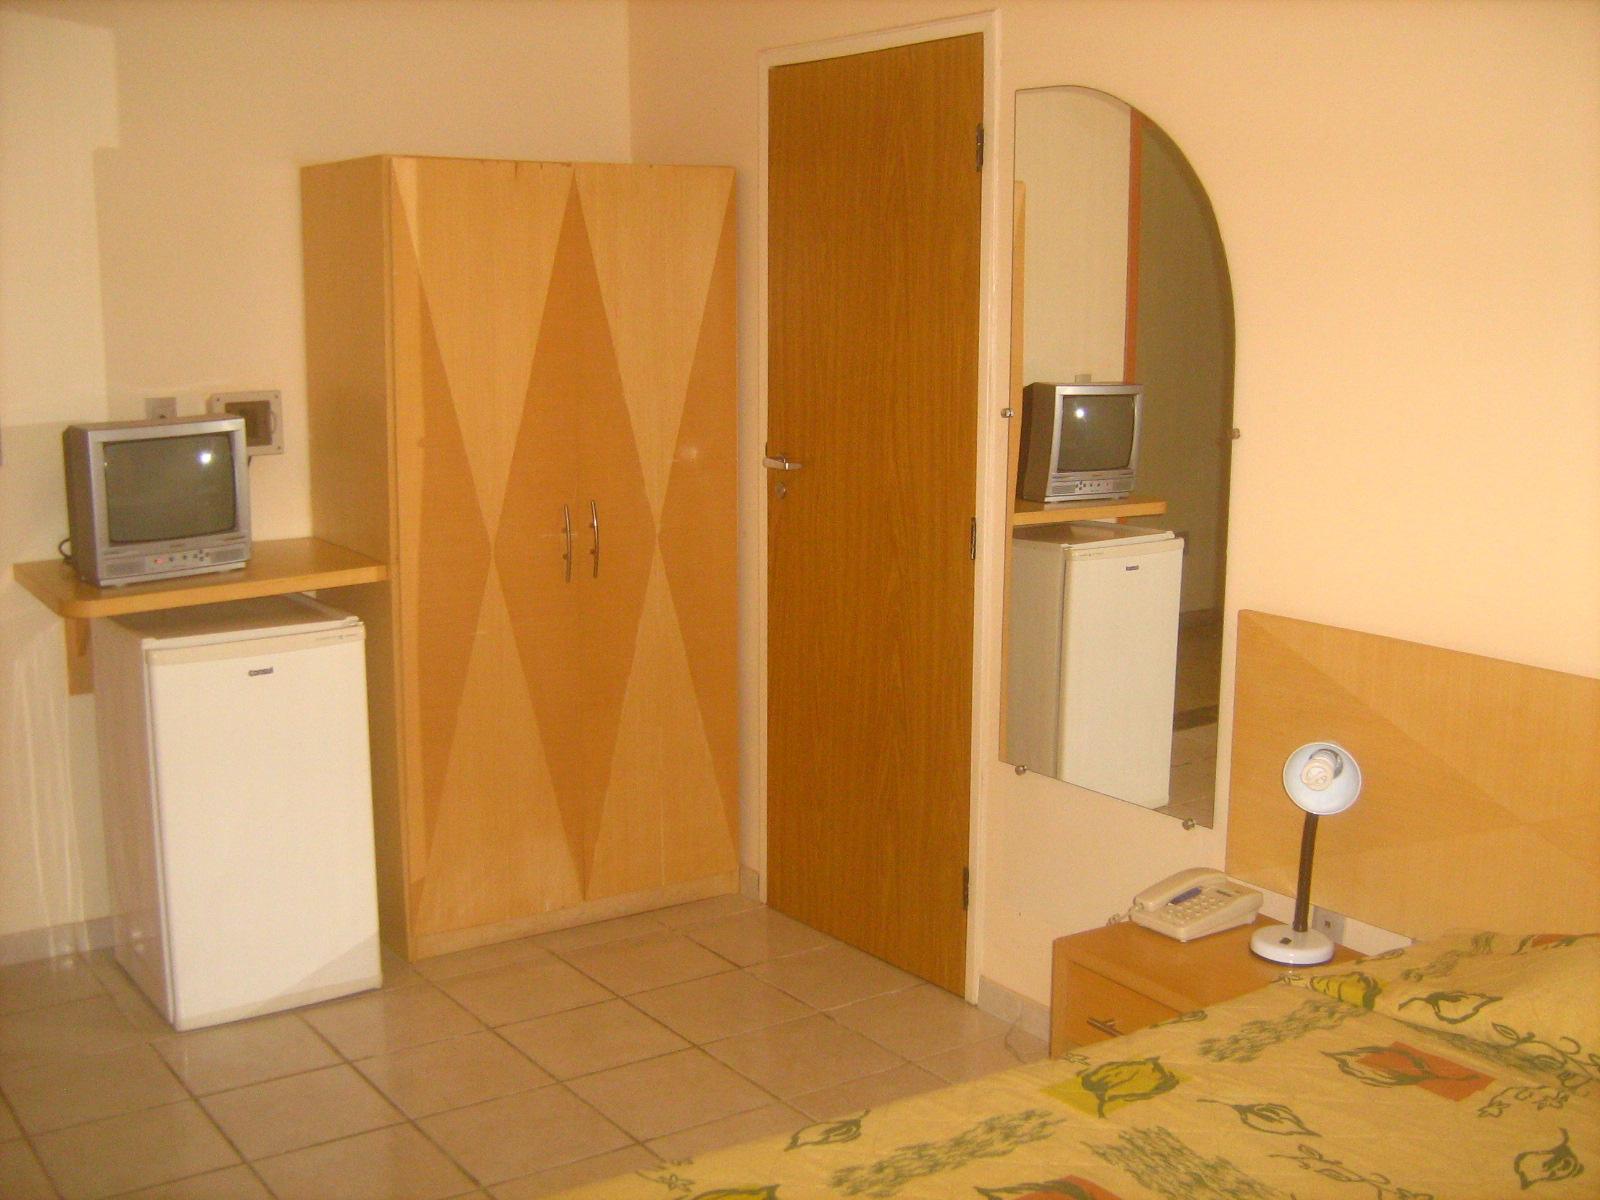 #935009 VIAJANTE ESPECIAL: Pousada Areia de Ouro Natal RN 1600x1200 px piso banheiro idoso